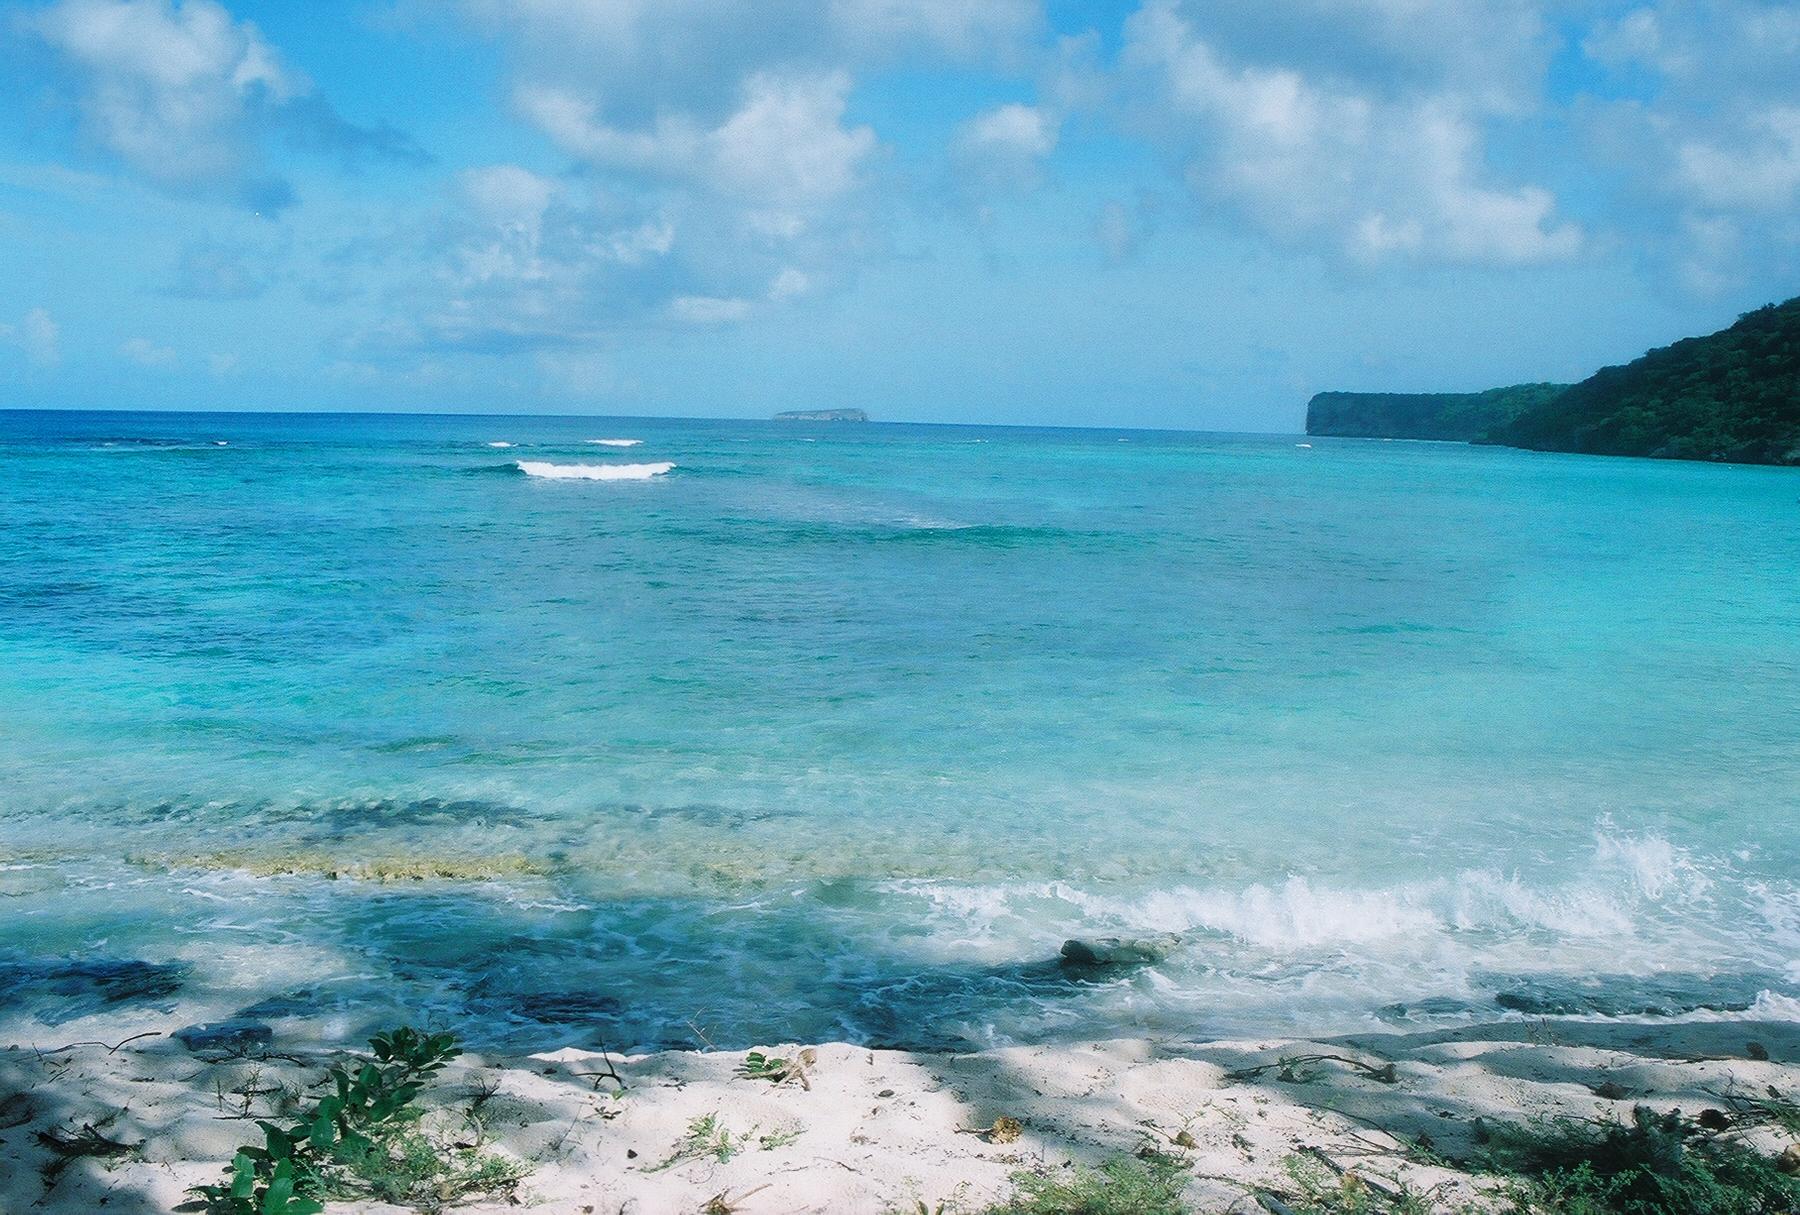 From Sardineras beach, one can see Monito Island, north of Mona Island. Photo: Pamy Rojas